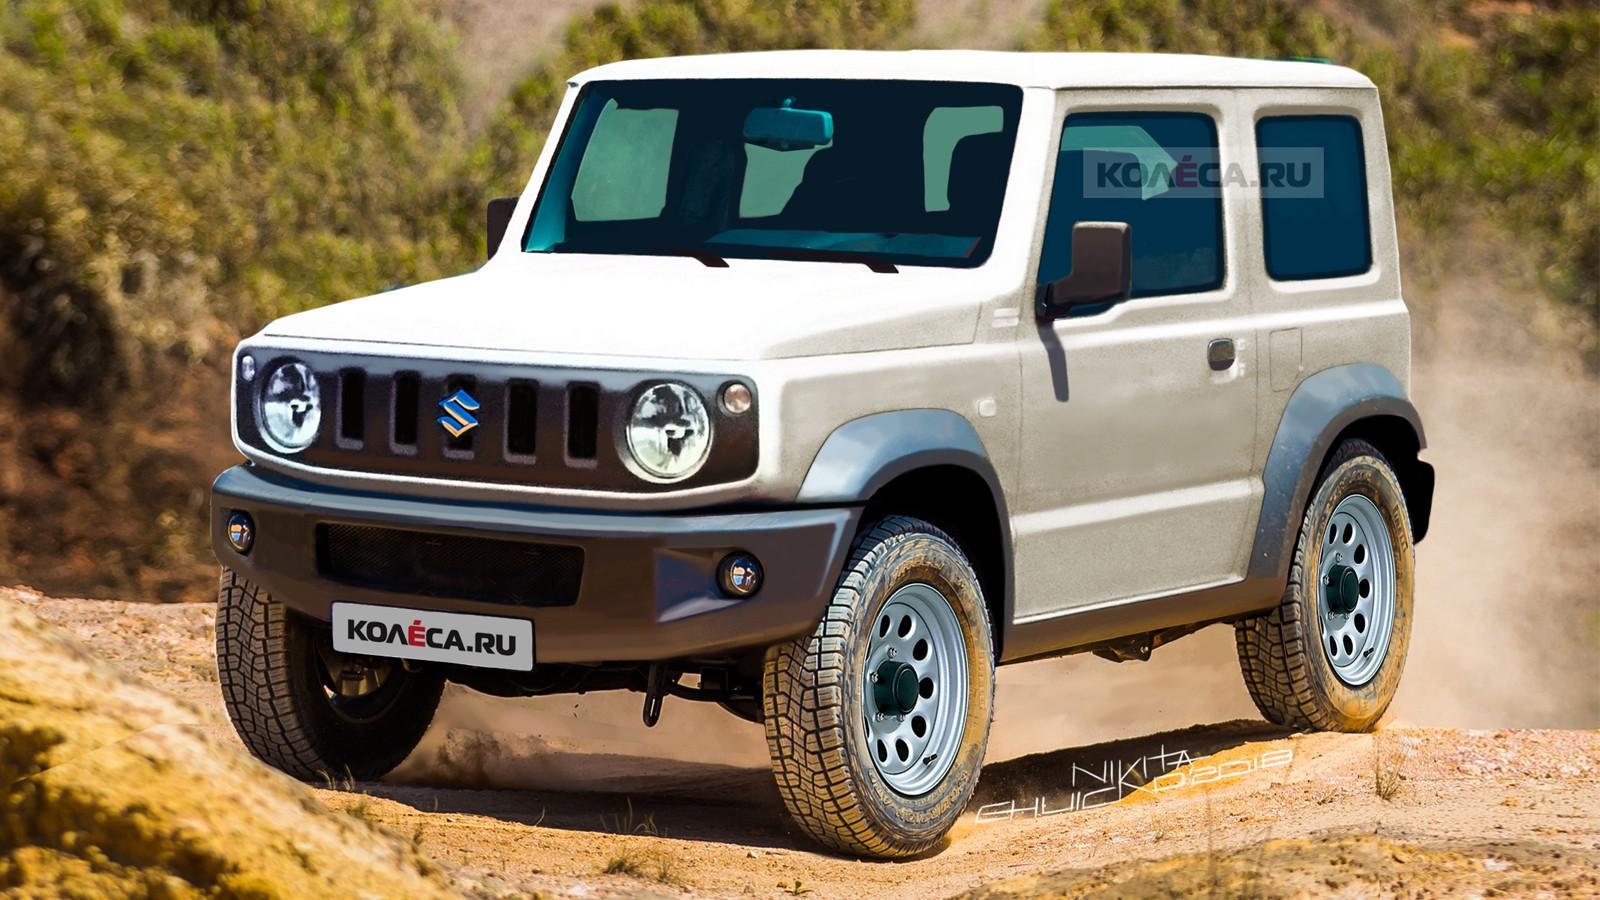 Suzuki Jimny front2